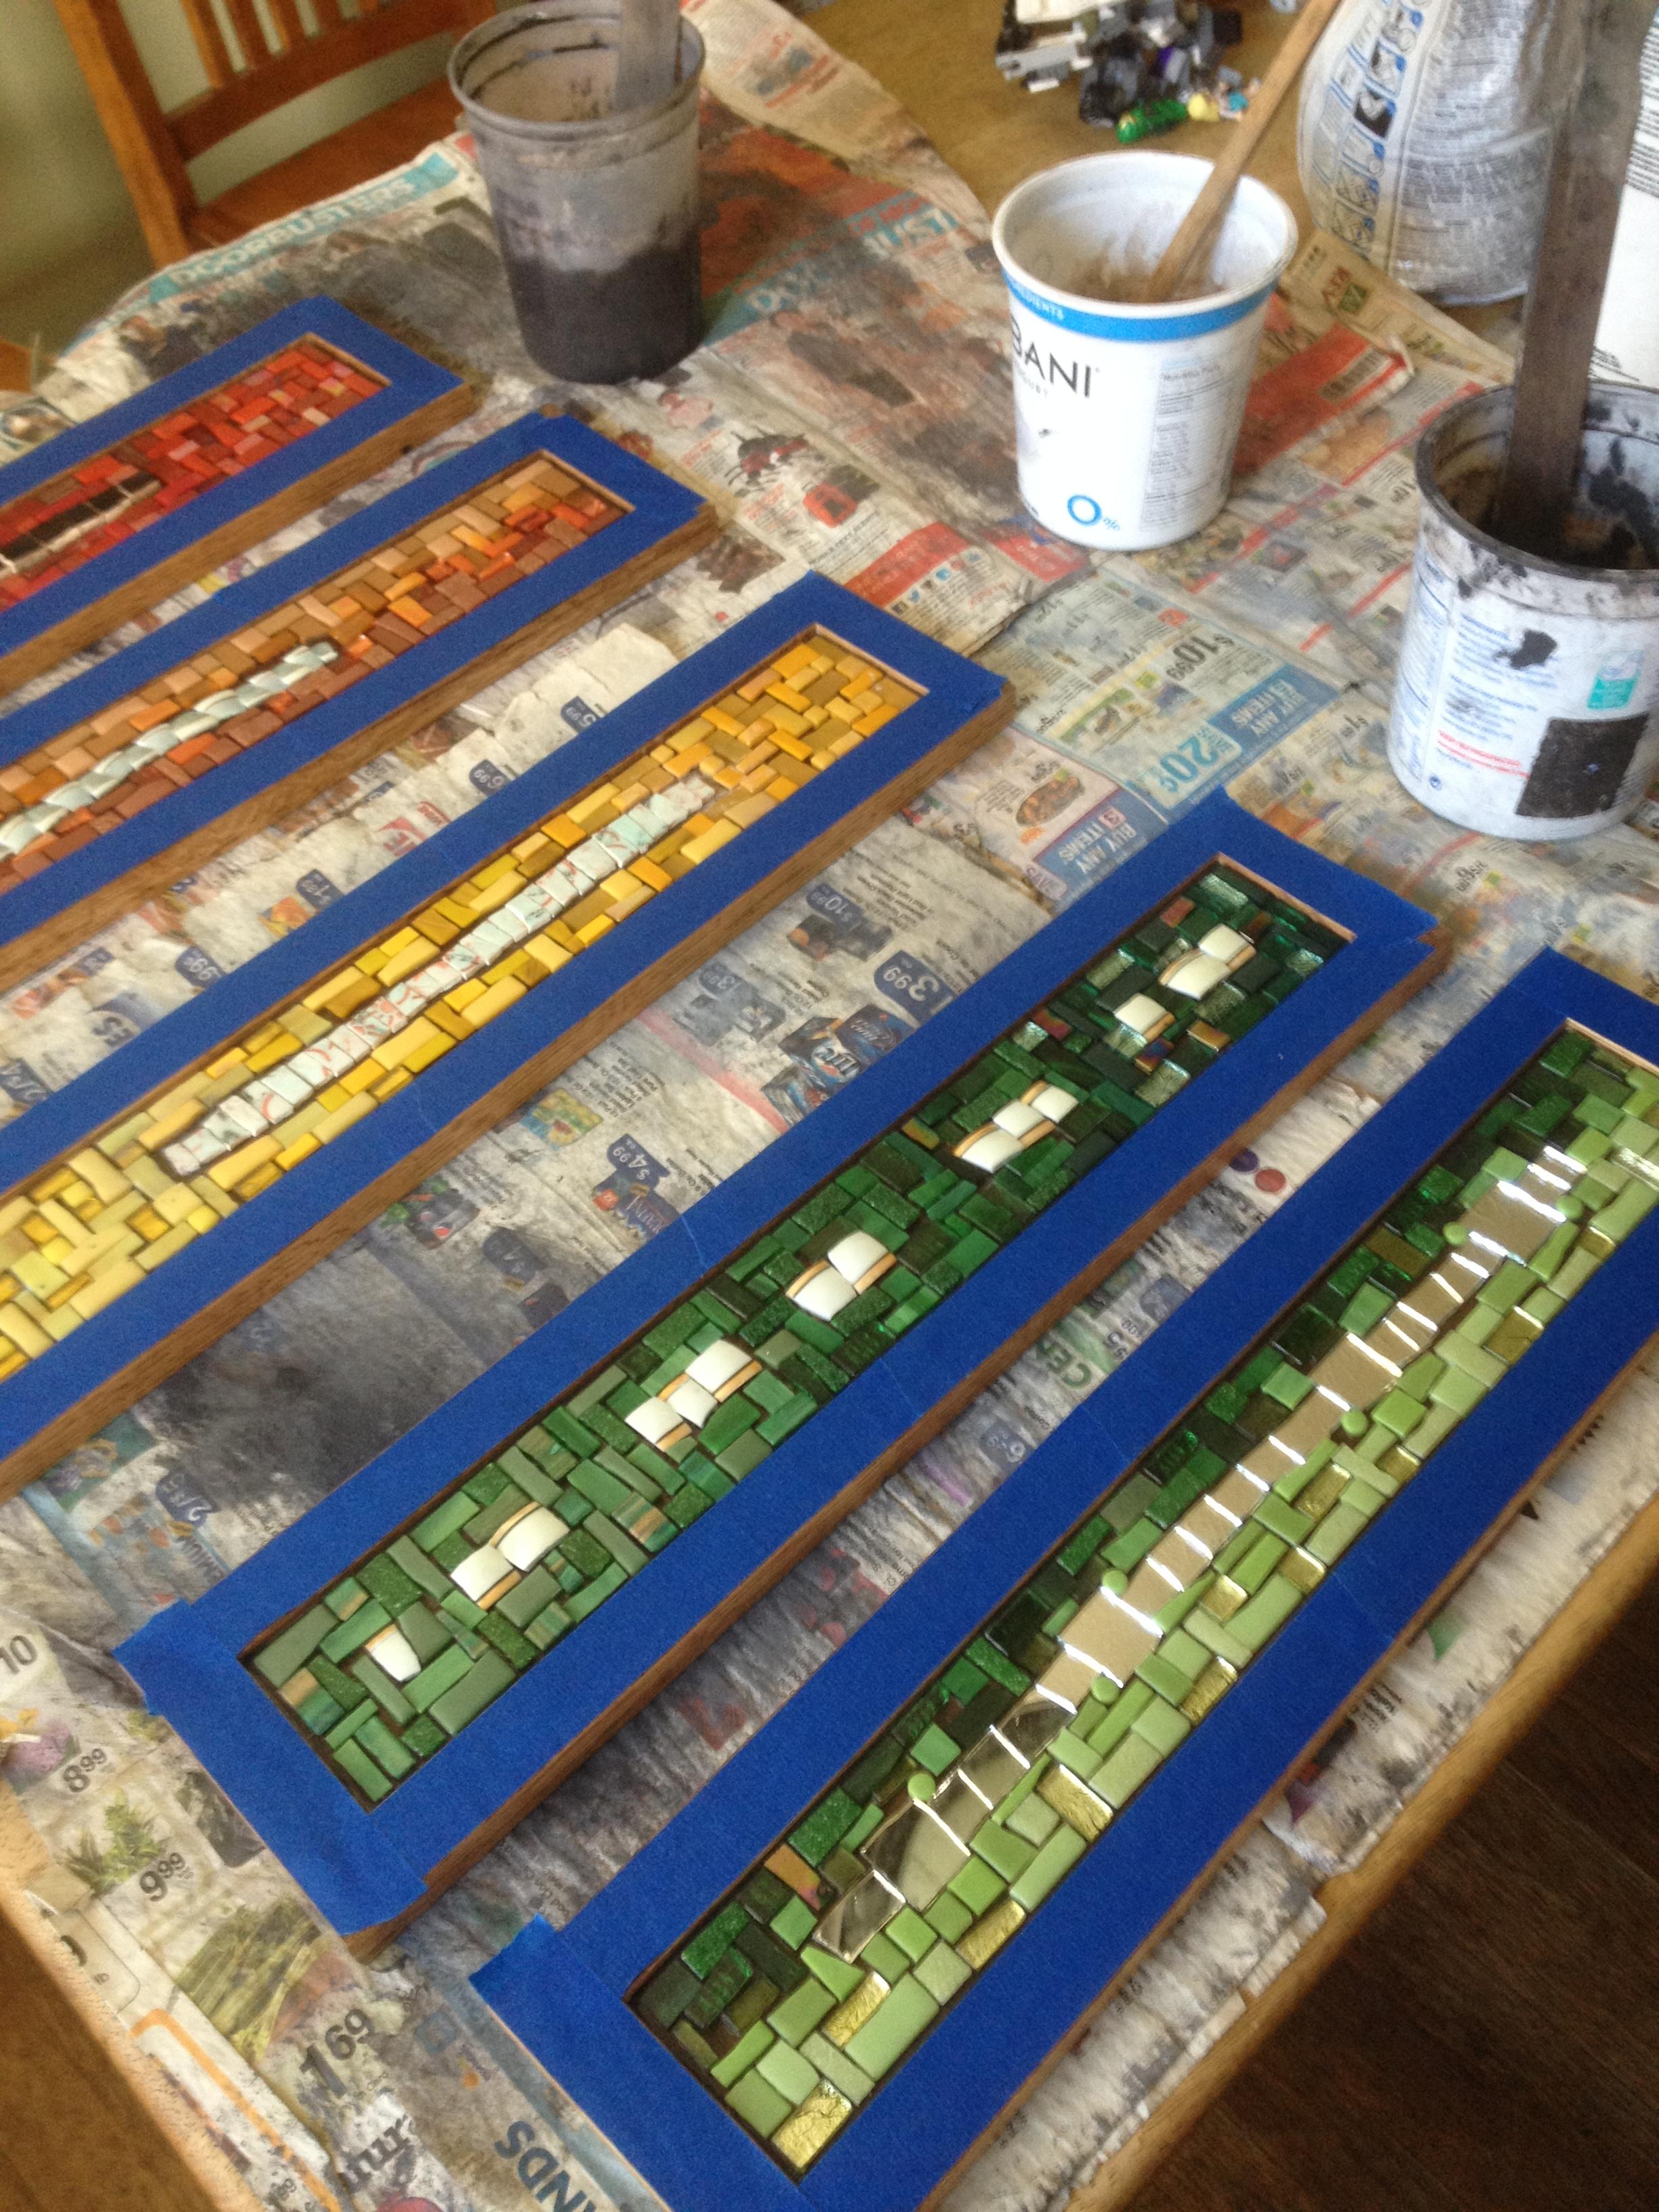 Grouting mosaic coat racks